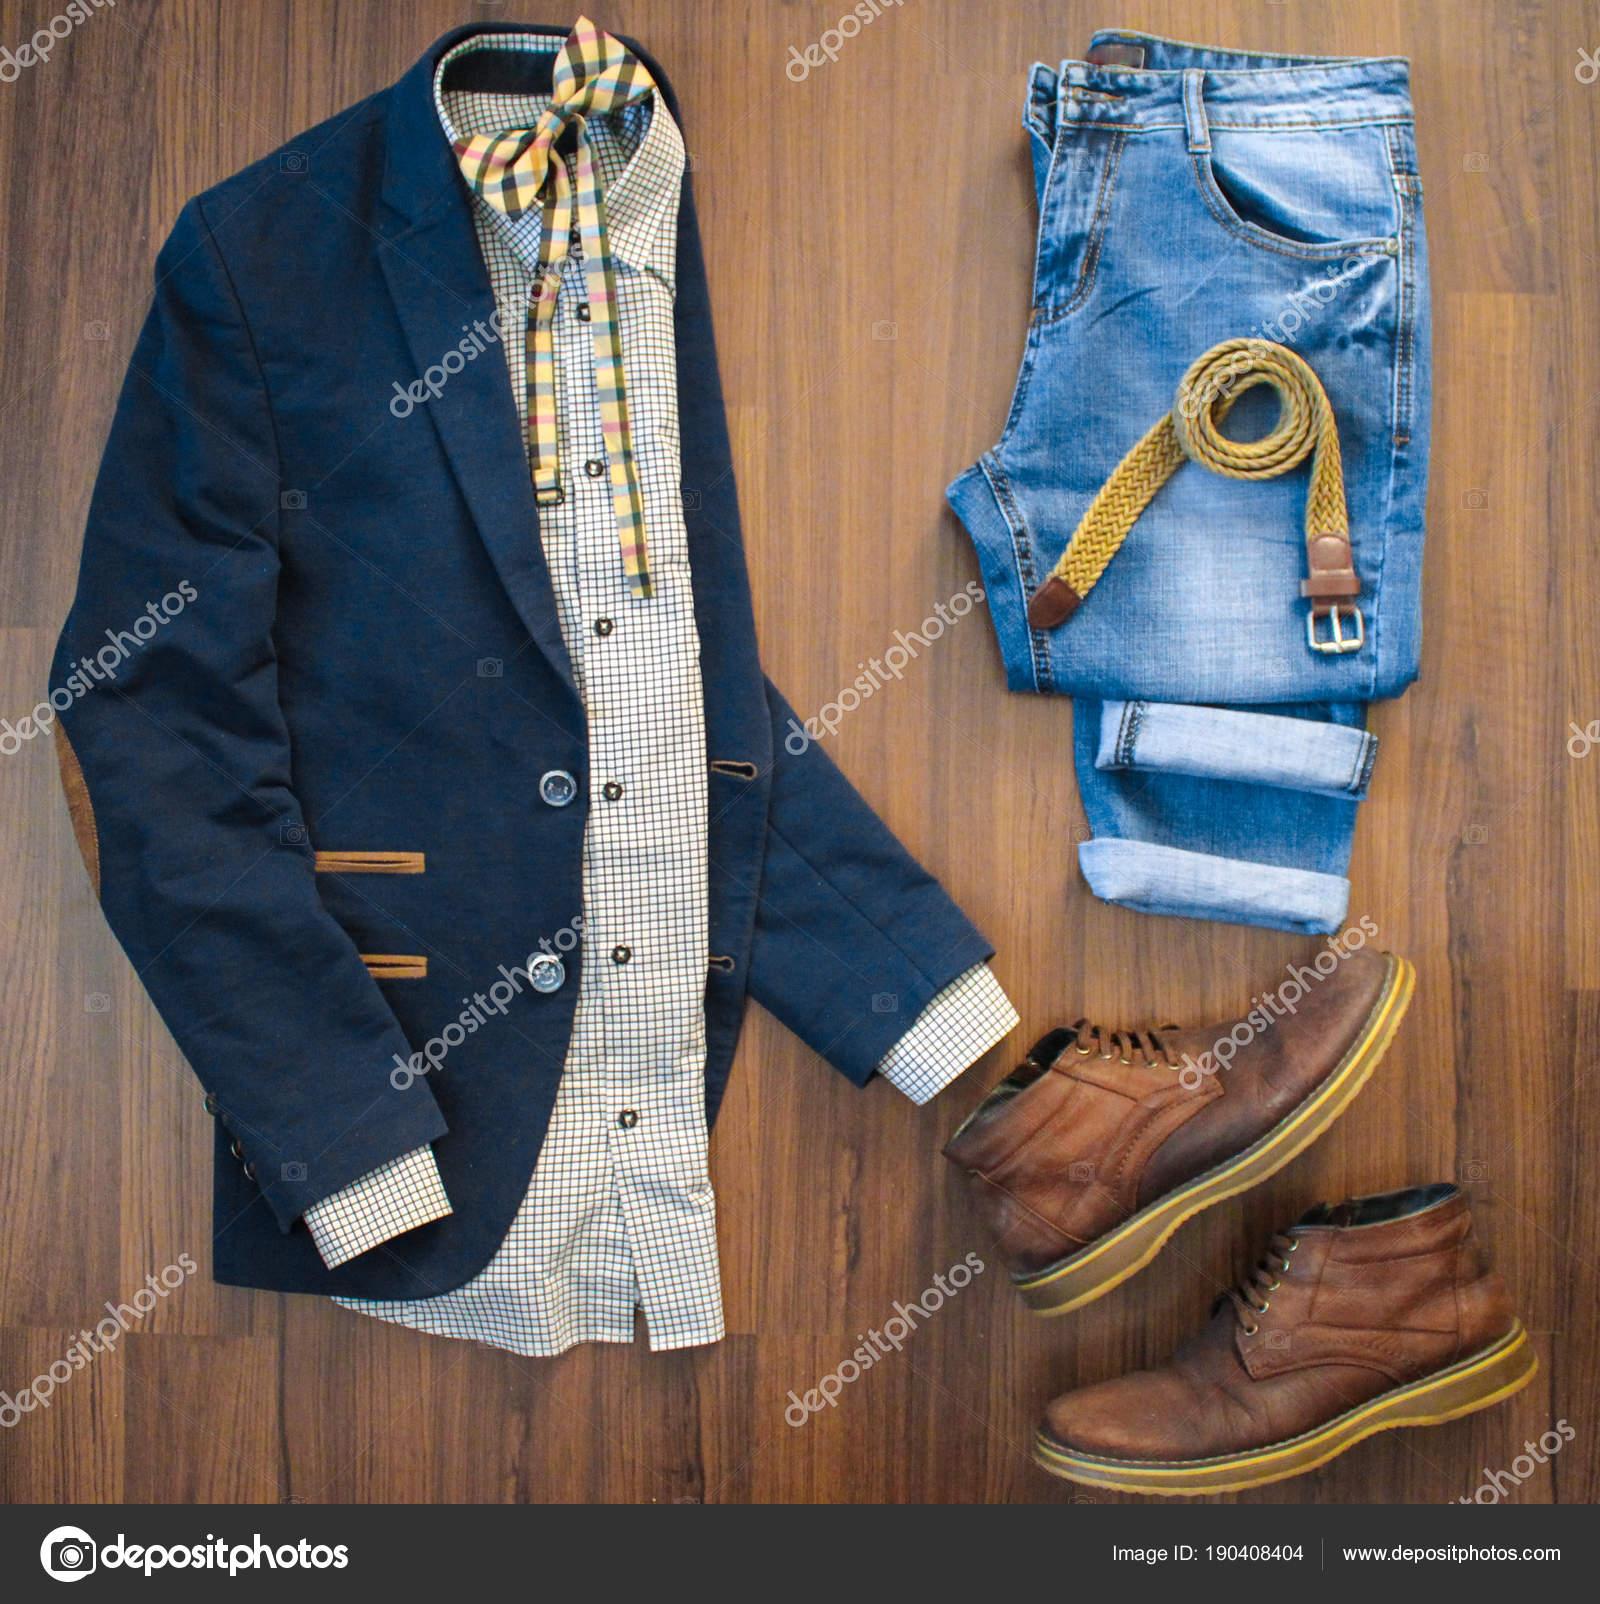 b4f3025b454a8 Plana se pone de ropa casual para hombre conjunto como traje azul con  parches